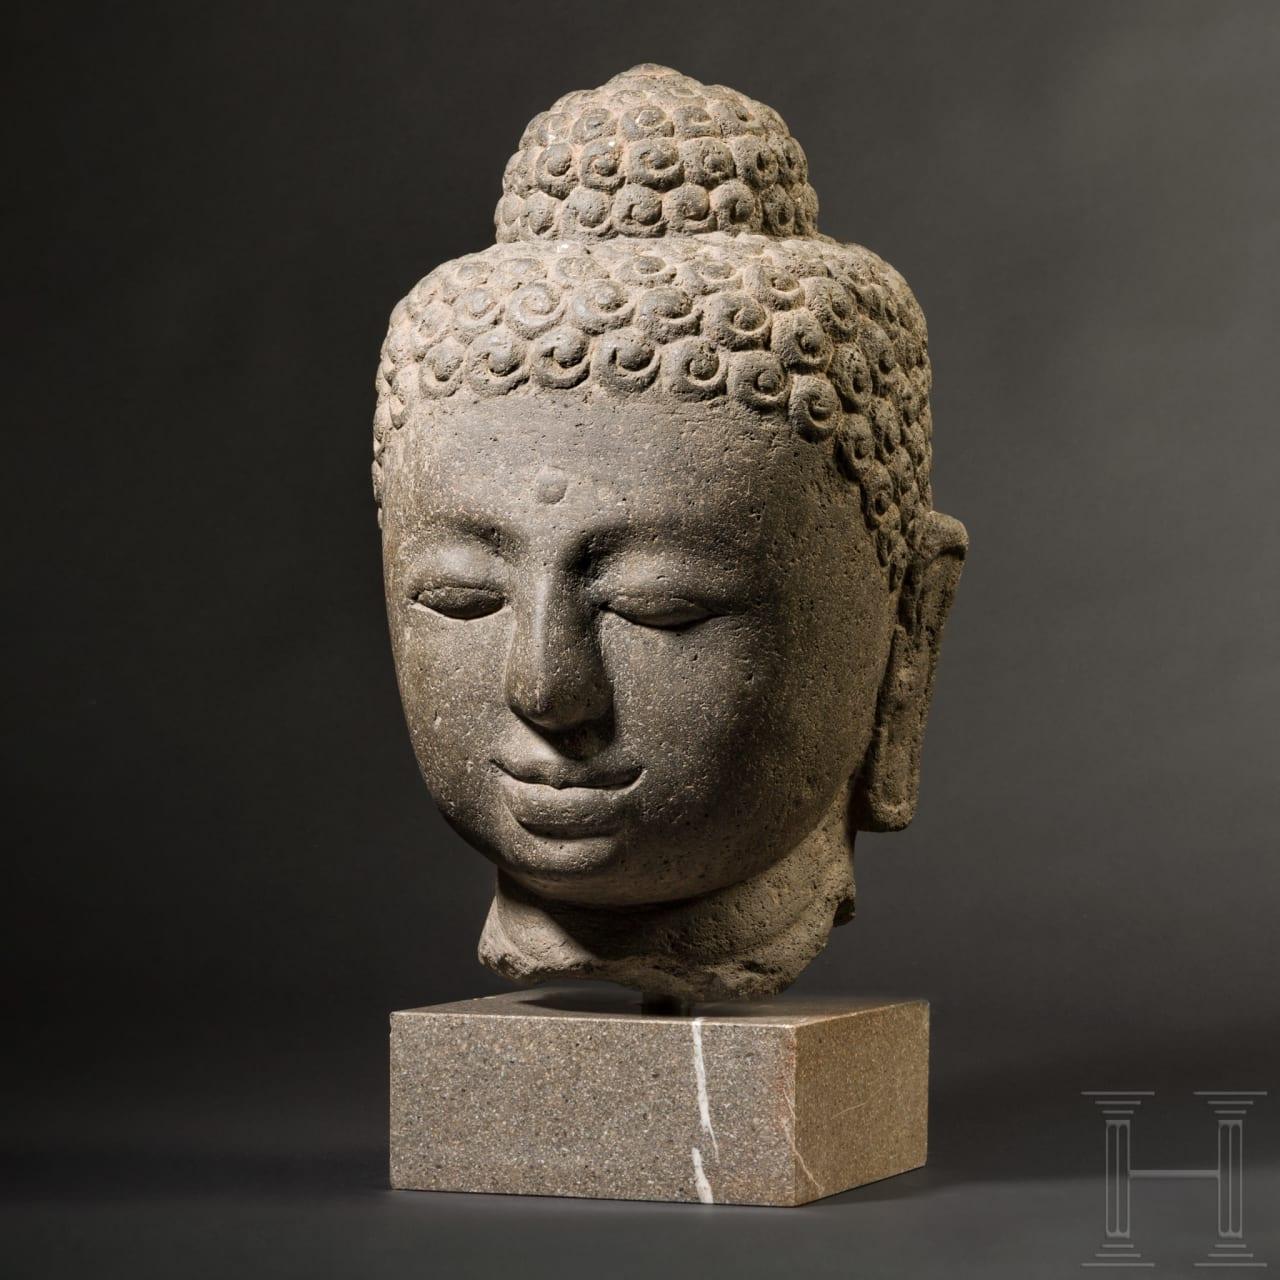 A large Buddha head carved in volcanic rock, Borobudur/Java, 9th century